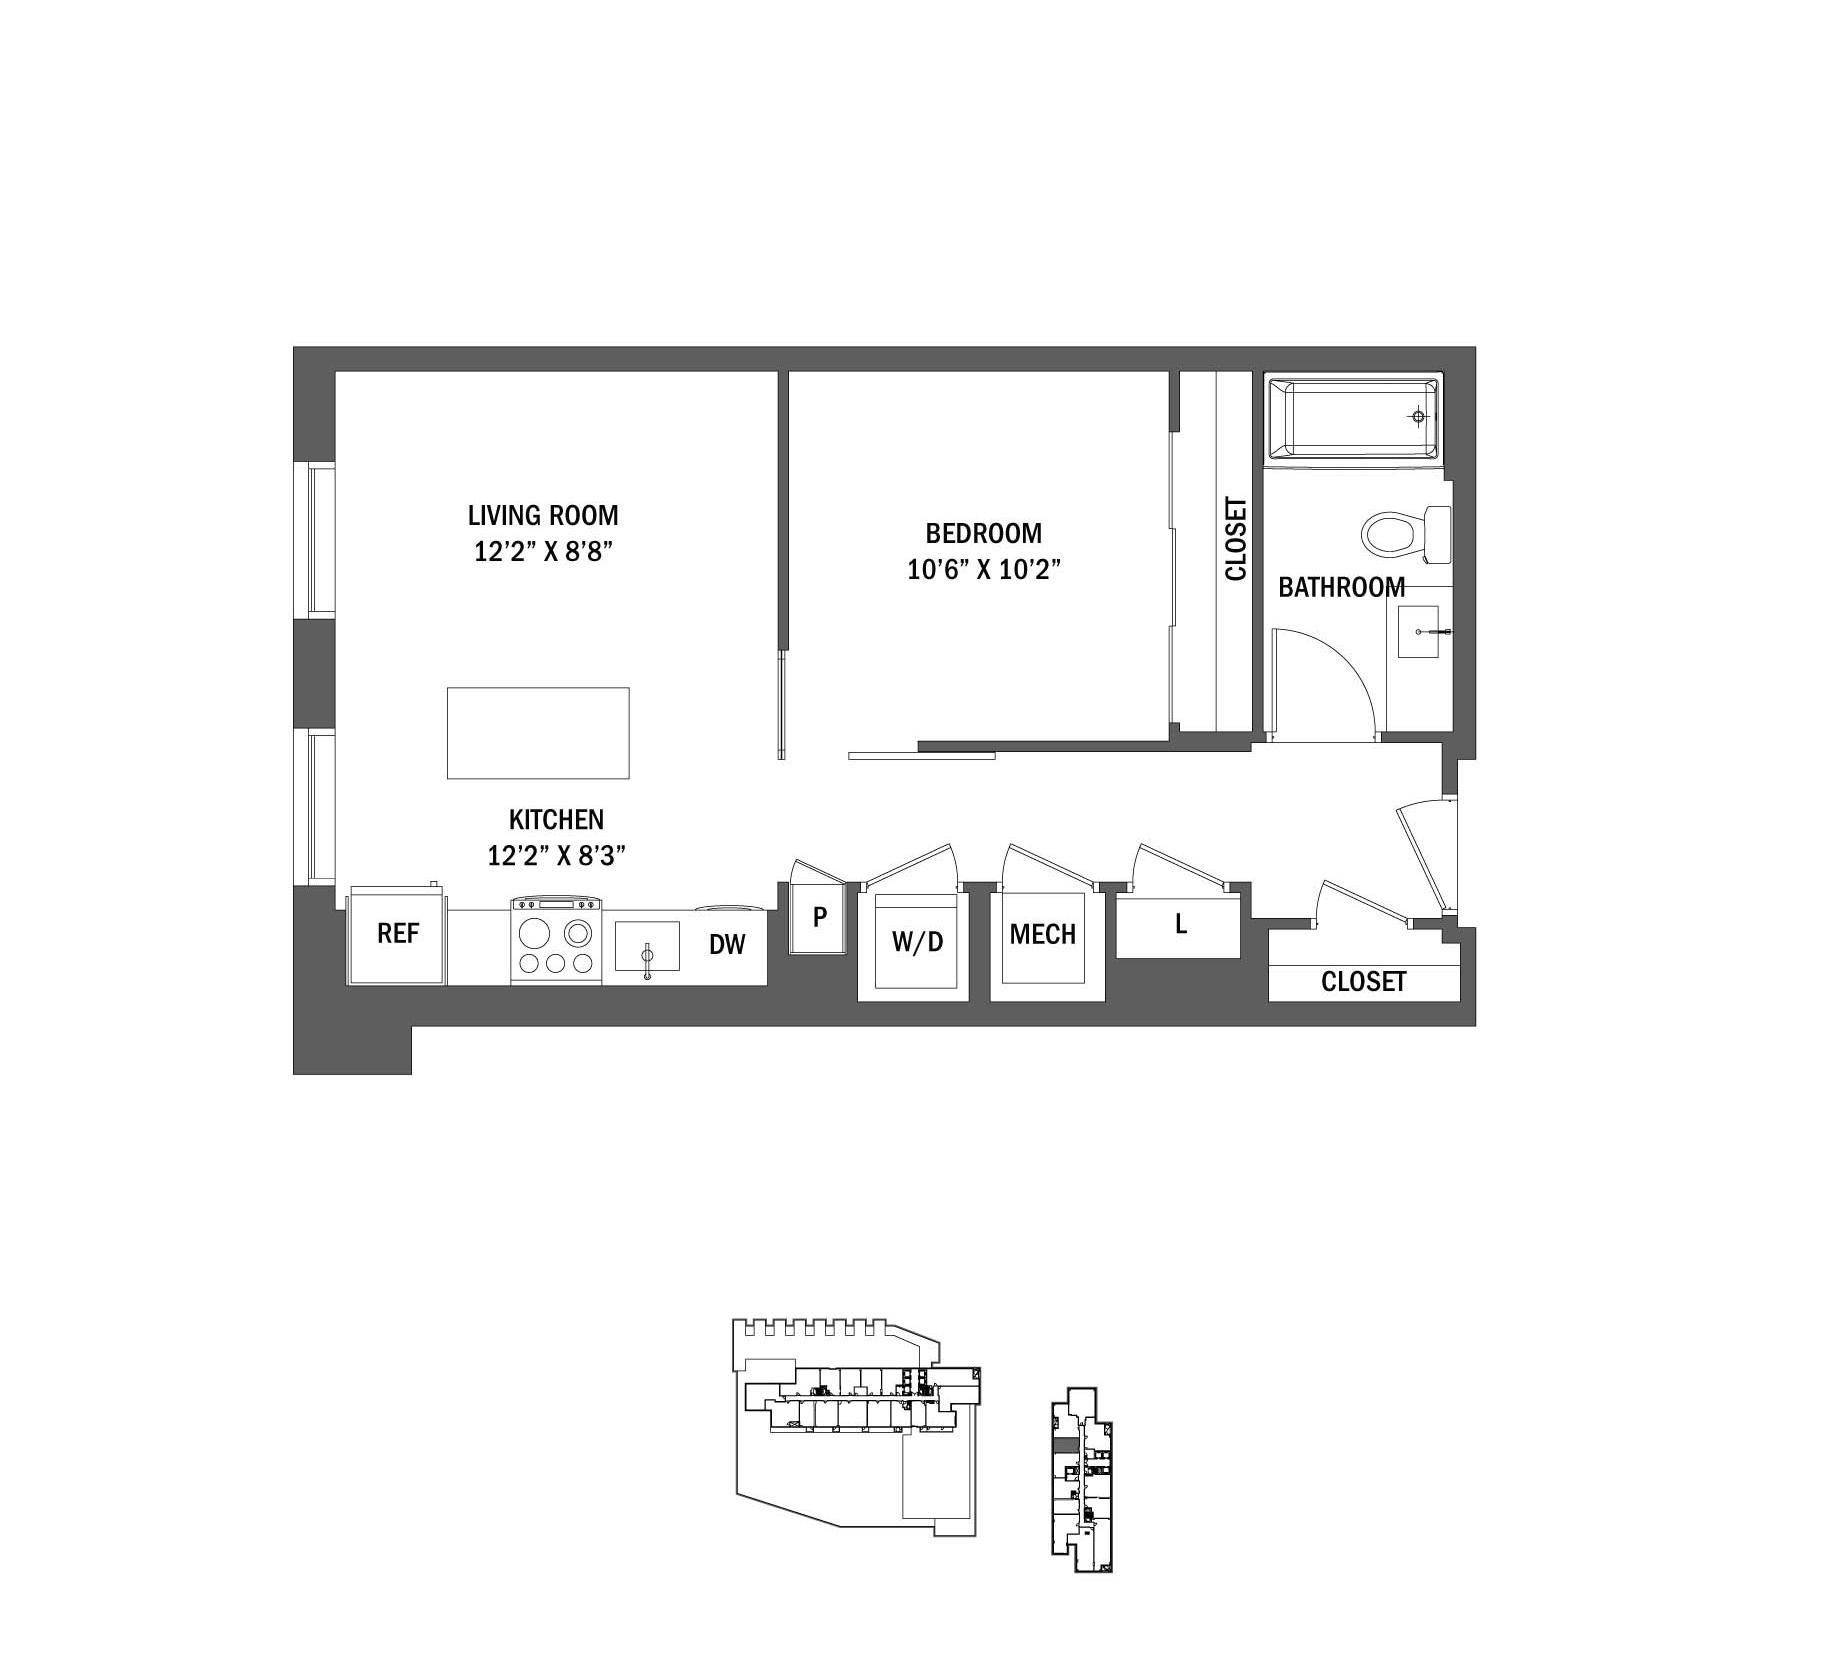 P0625338 789sa04 e04 typ 2 floorplan